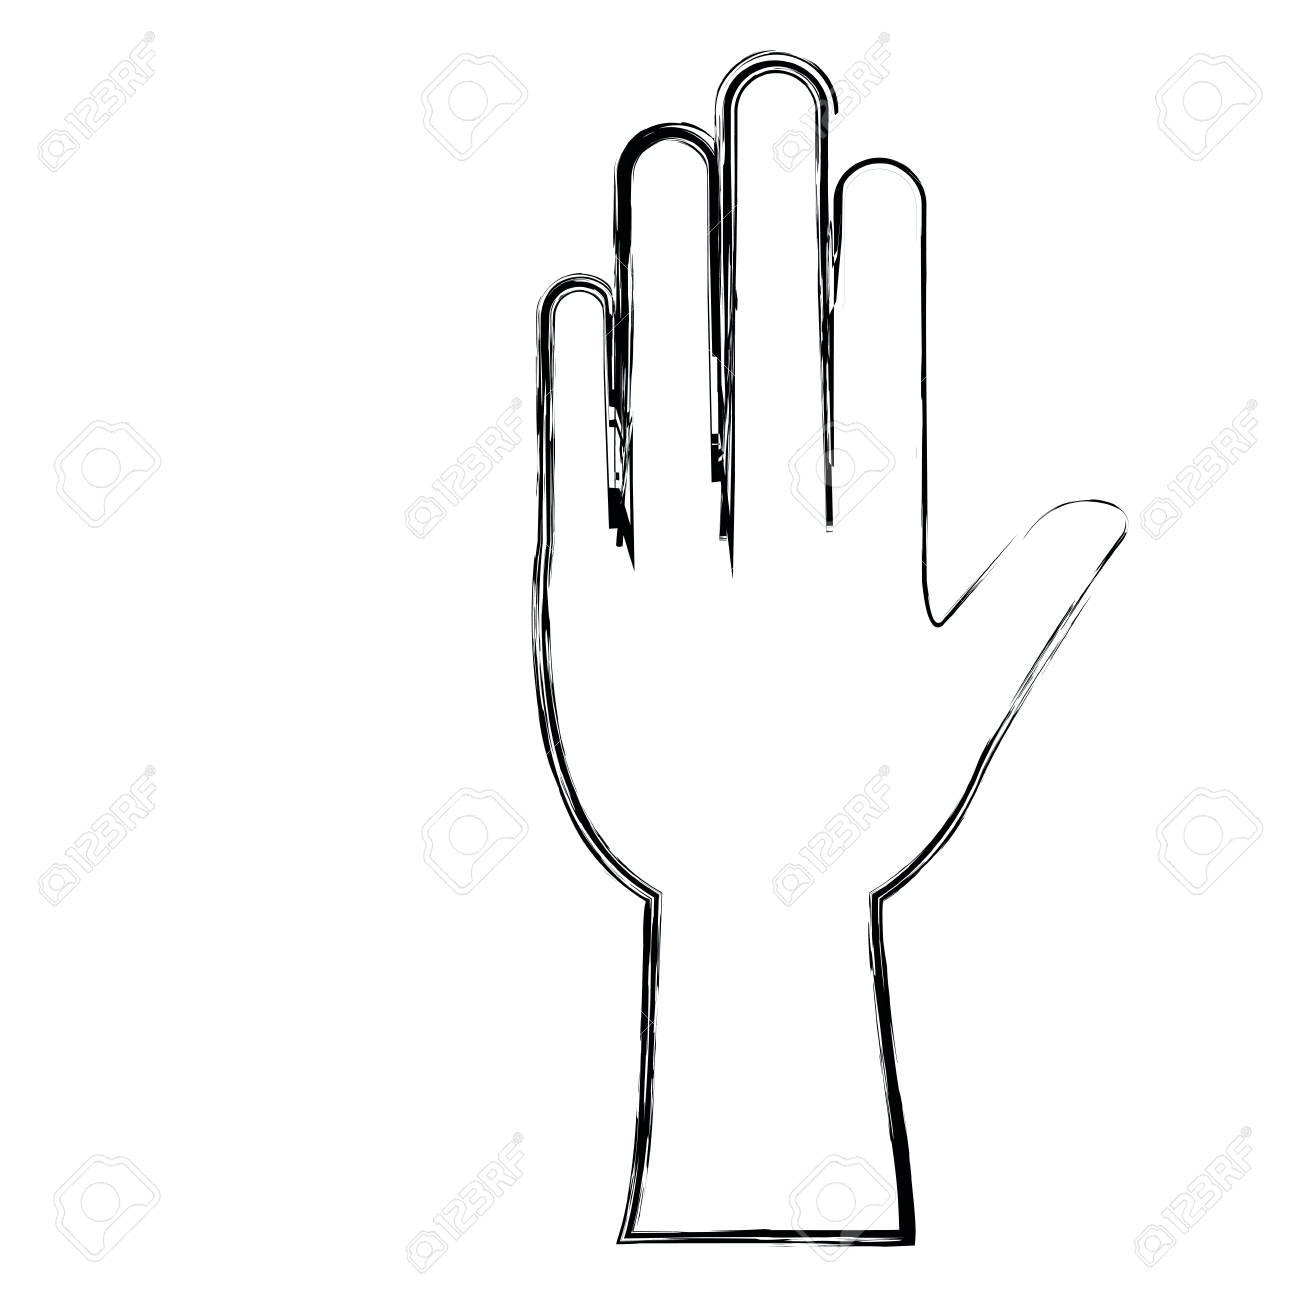 monochrome blurred silhouette of left hand vector illustration rh 123rf com left hand rule vector product left hand right hand vector